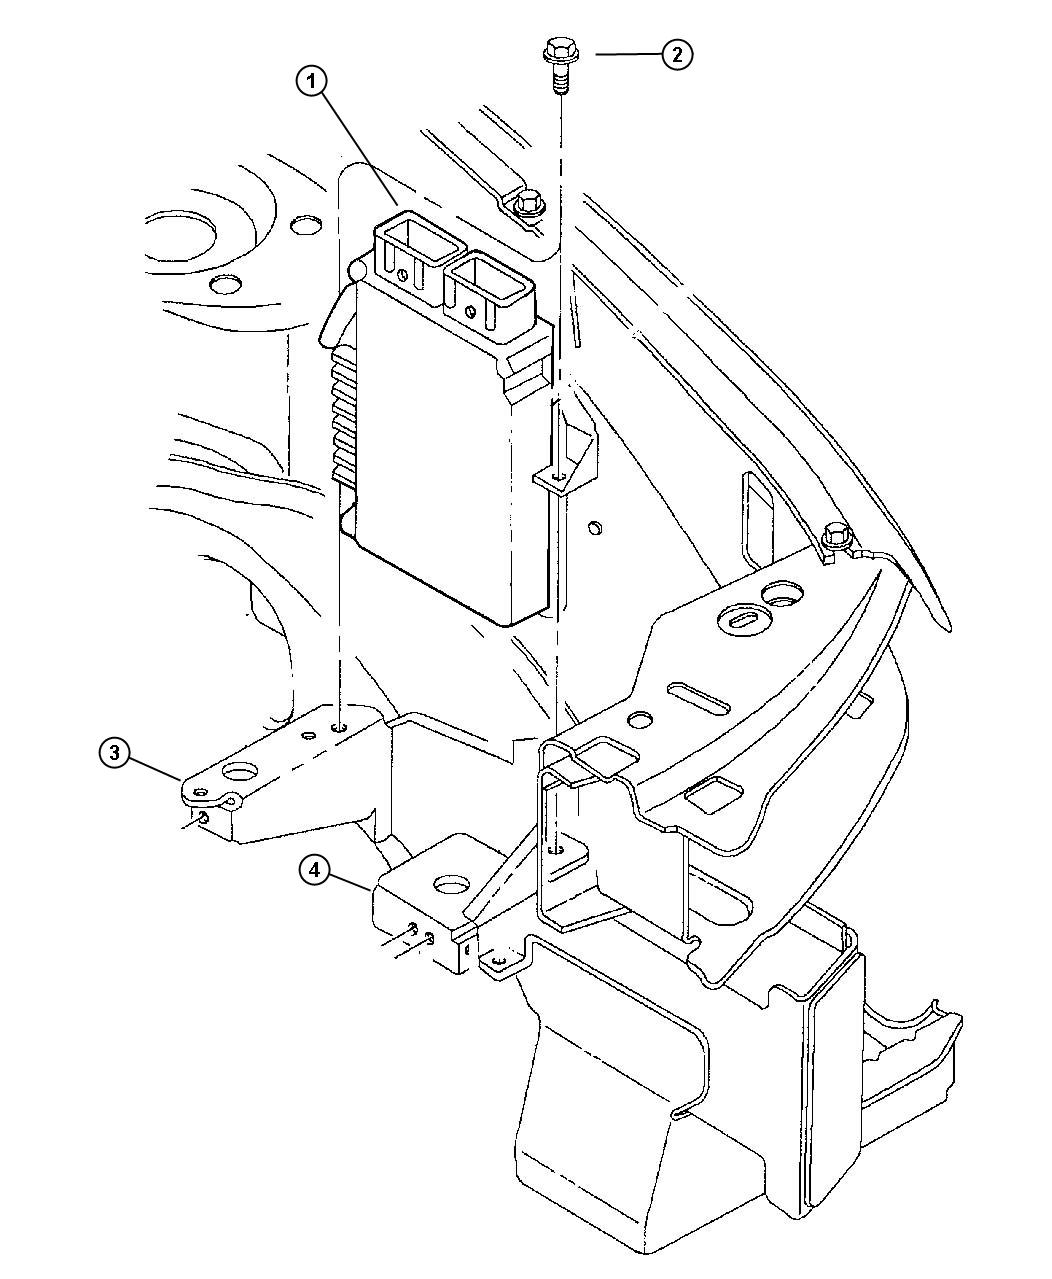 Dodge Stratus Module. Engine controller. Federal emissions